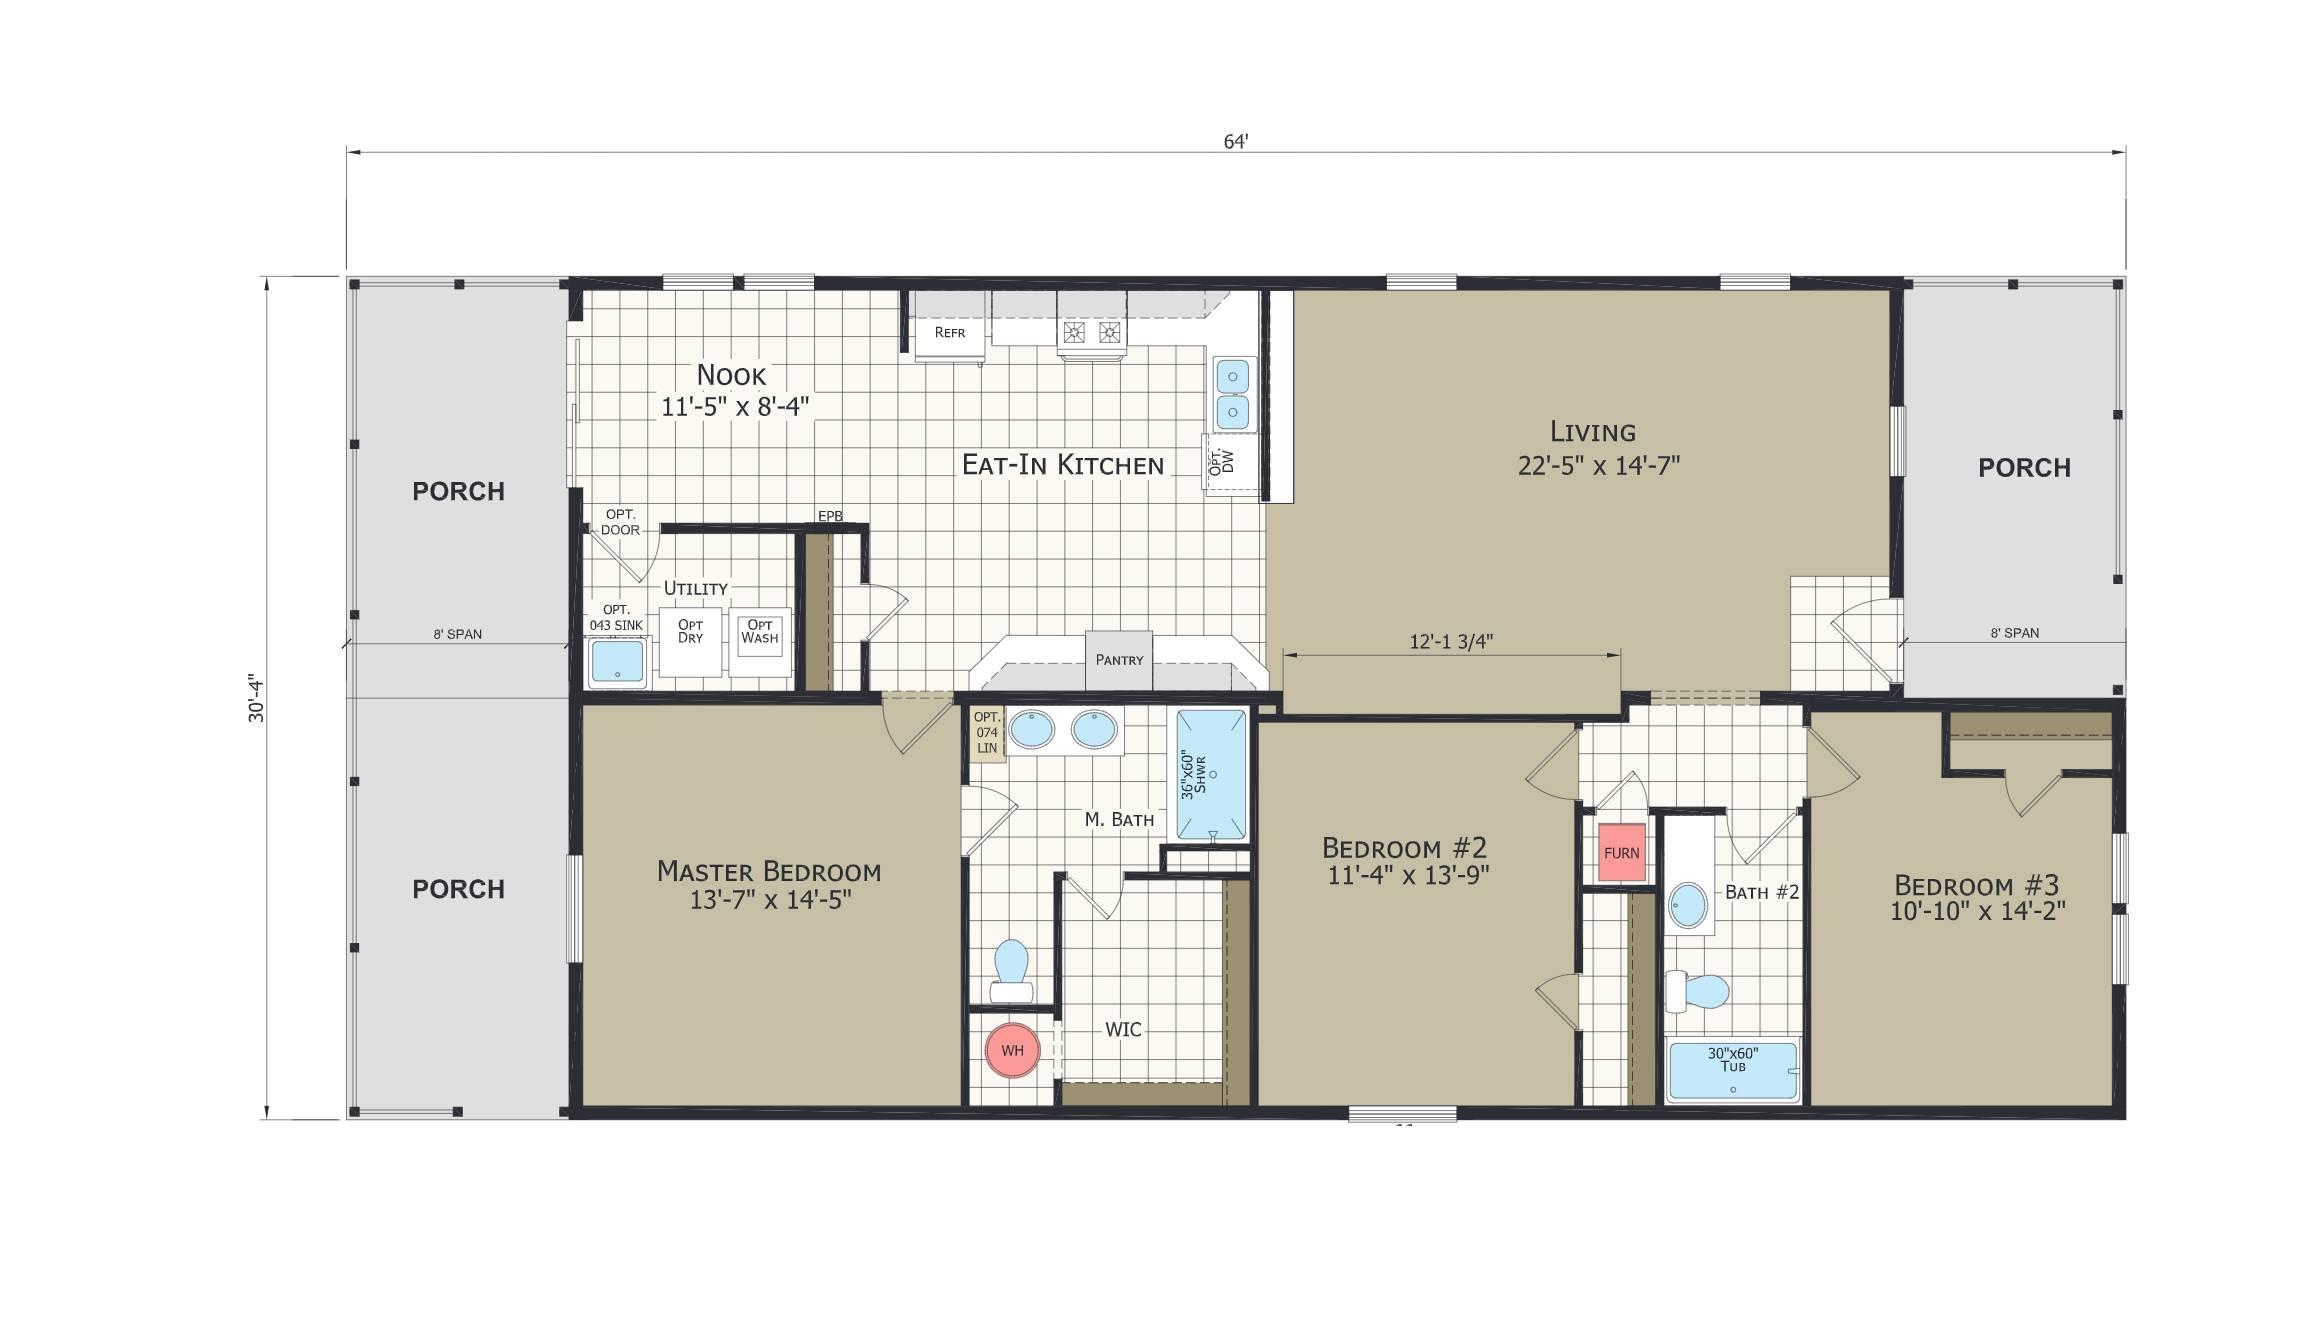 floorplan image for unit 331